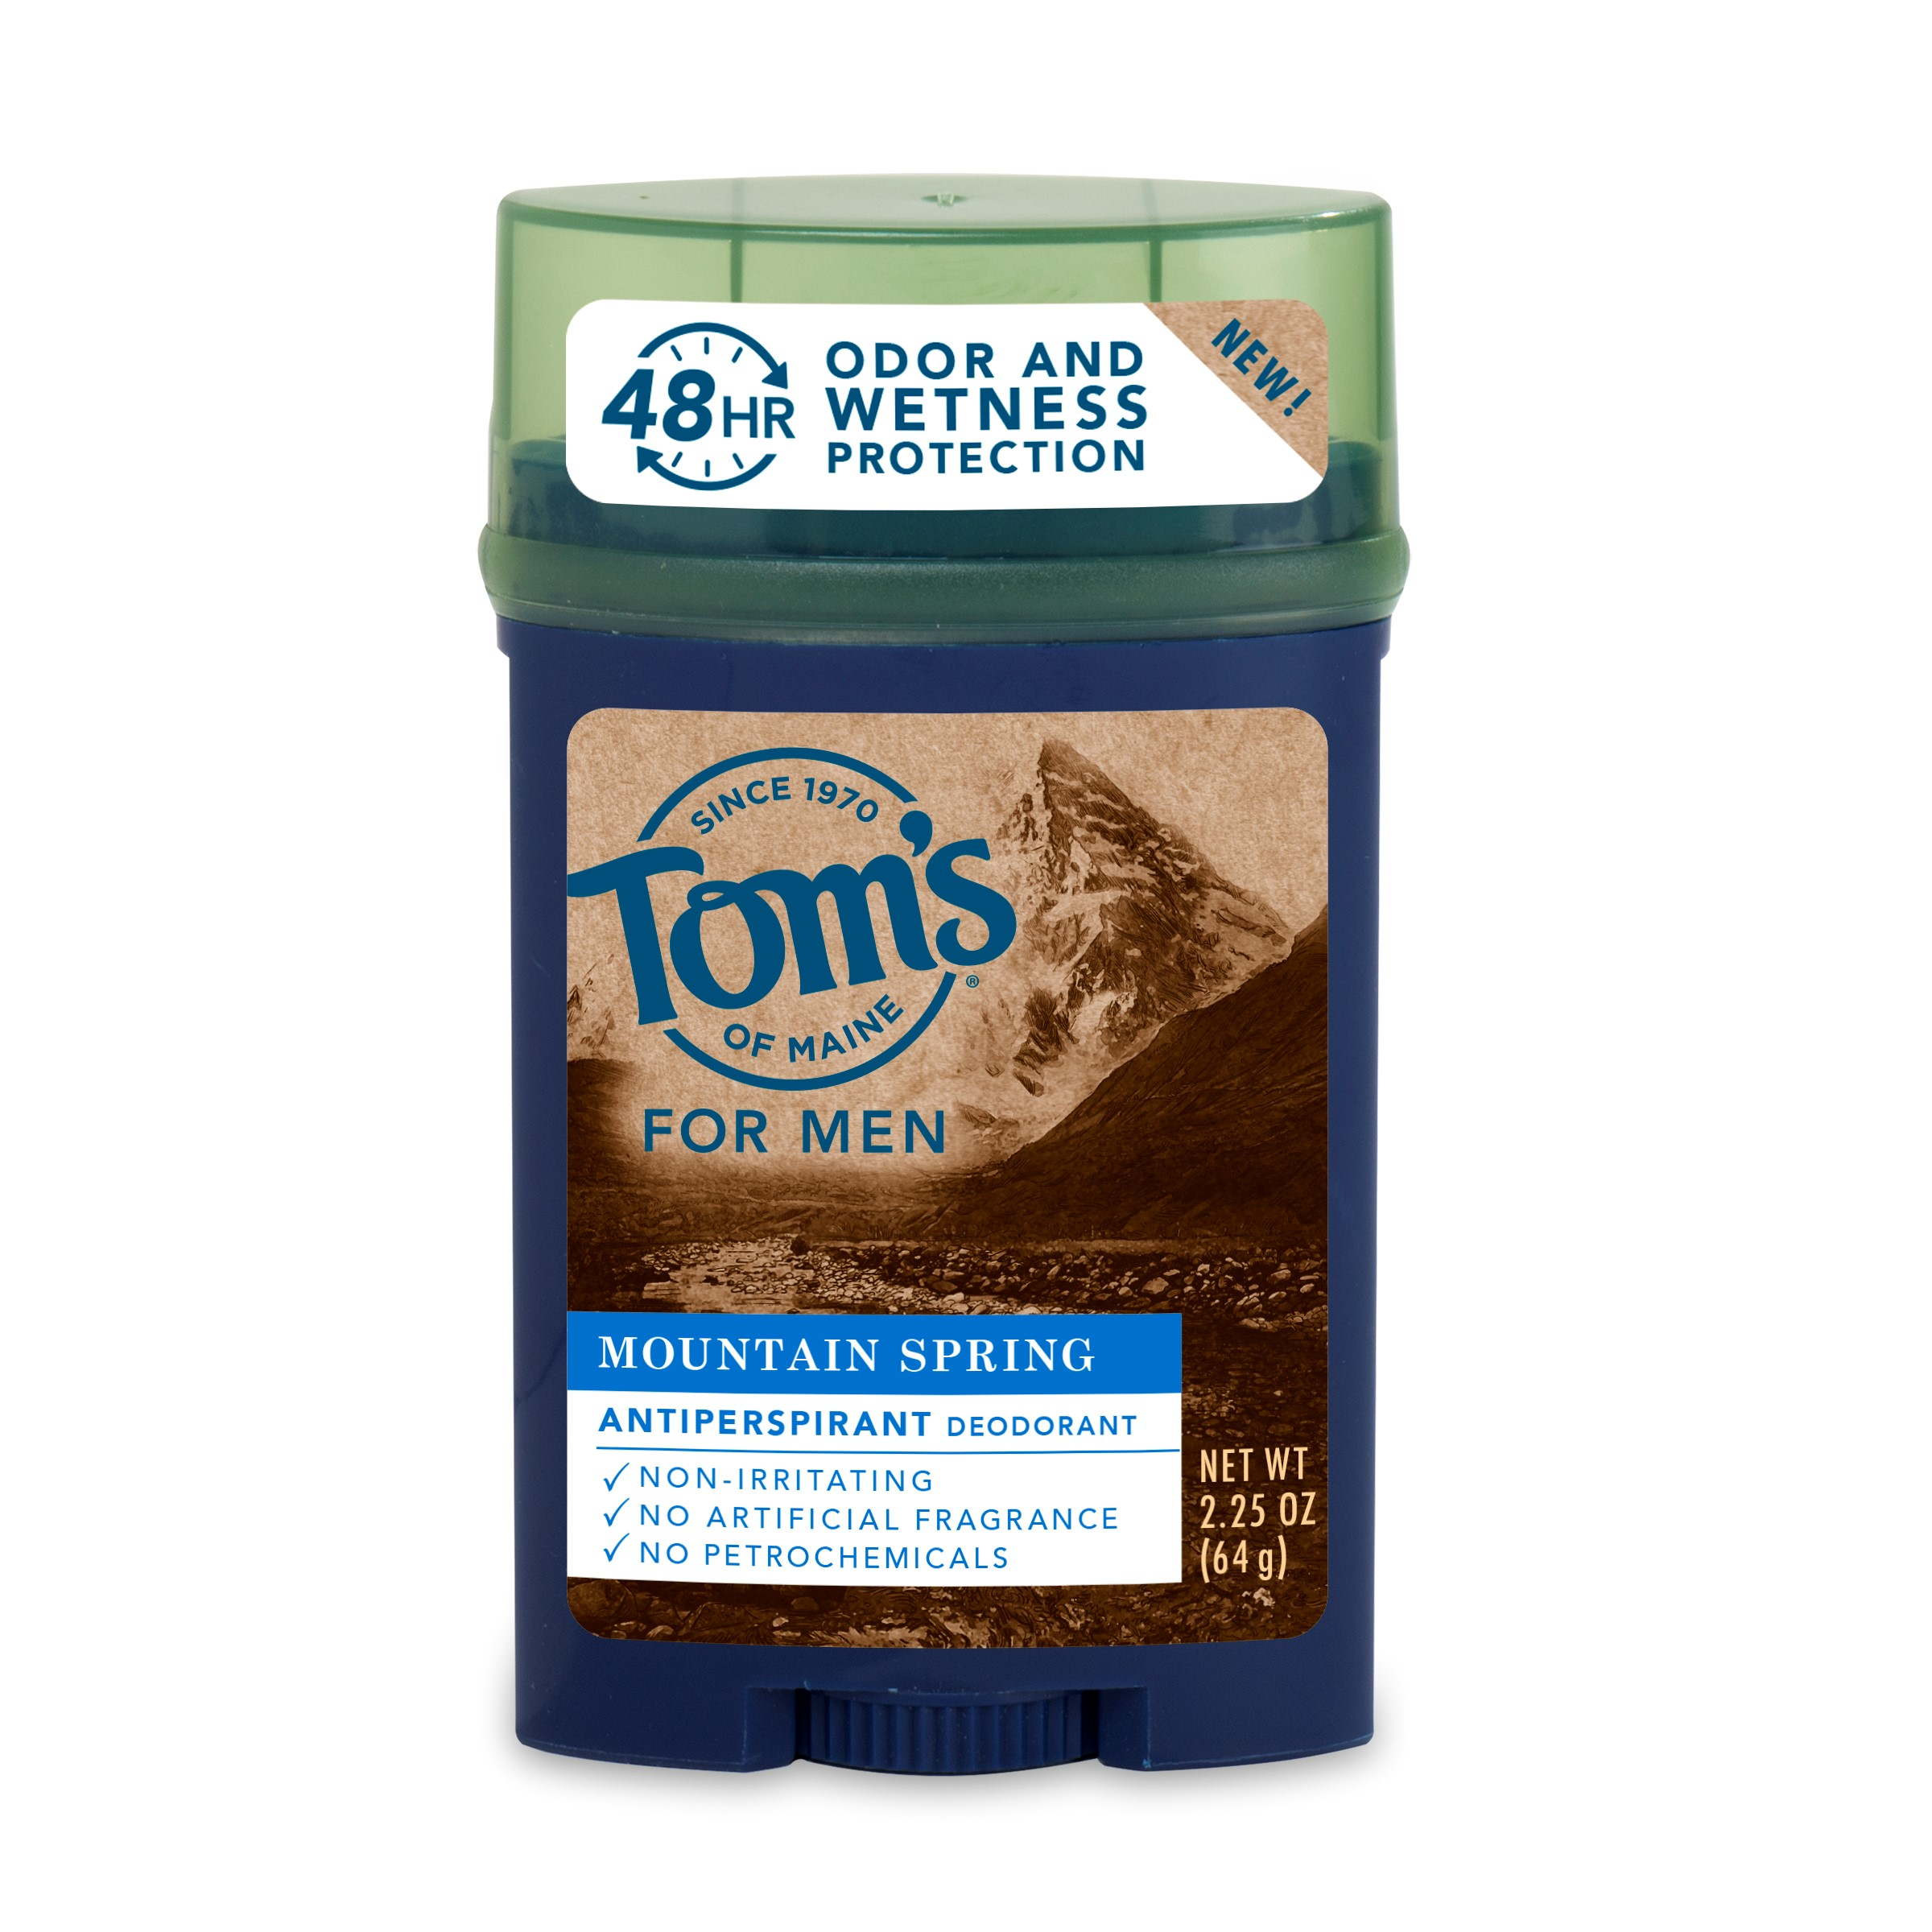 Tom's of Maine Men's Antiperspirant, Mountain Spring, 2.25oz